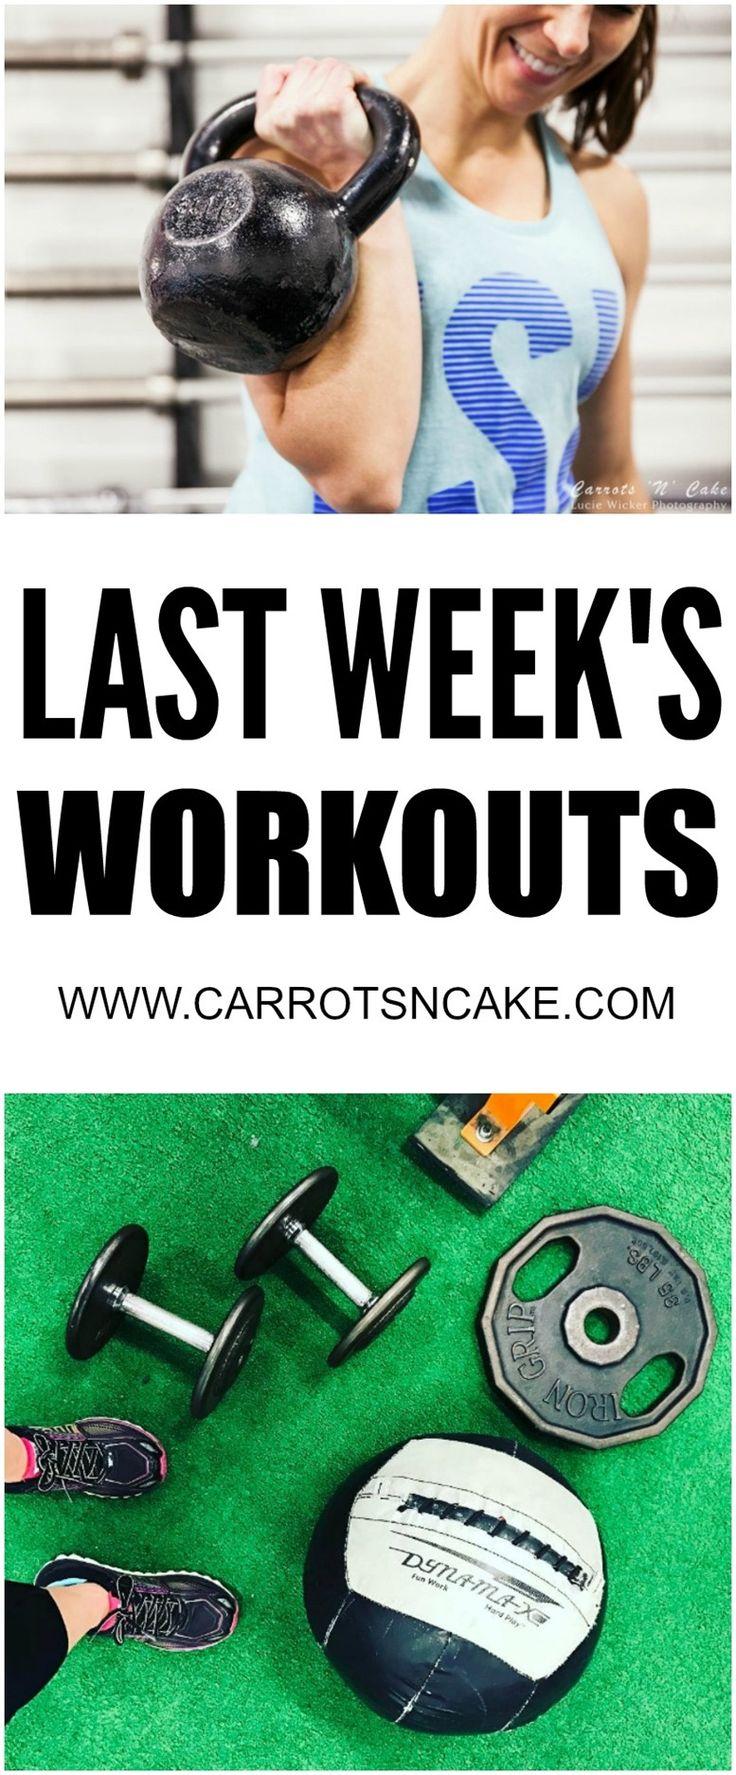 Weekend Favorites + Last Week's Workouts http://carrotsncake.com/2017/02/weekend-favorites-last-weeks-workouts.html